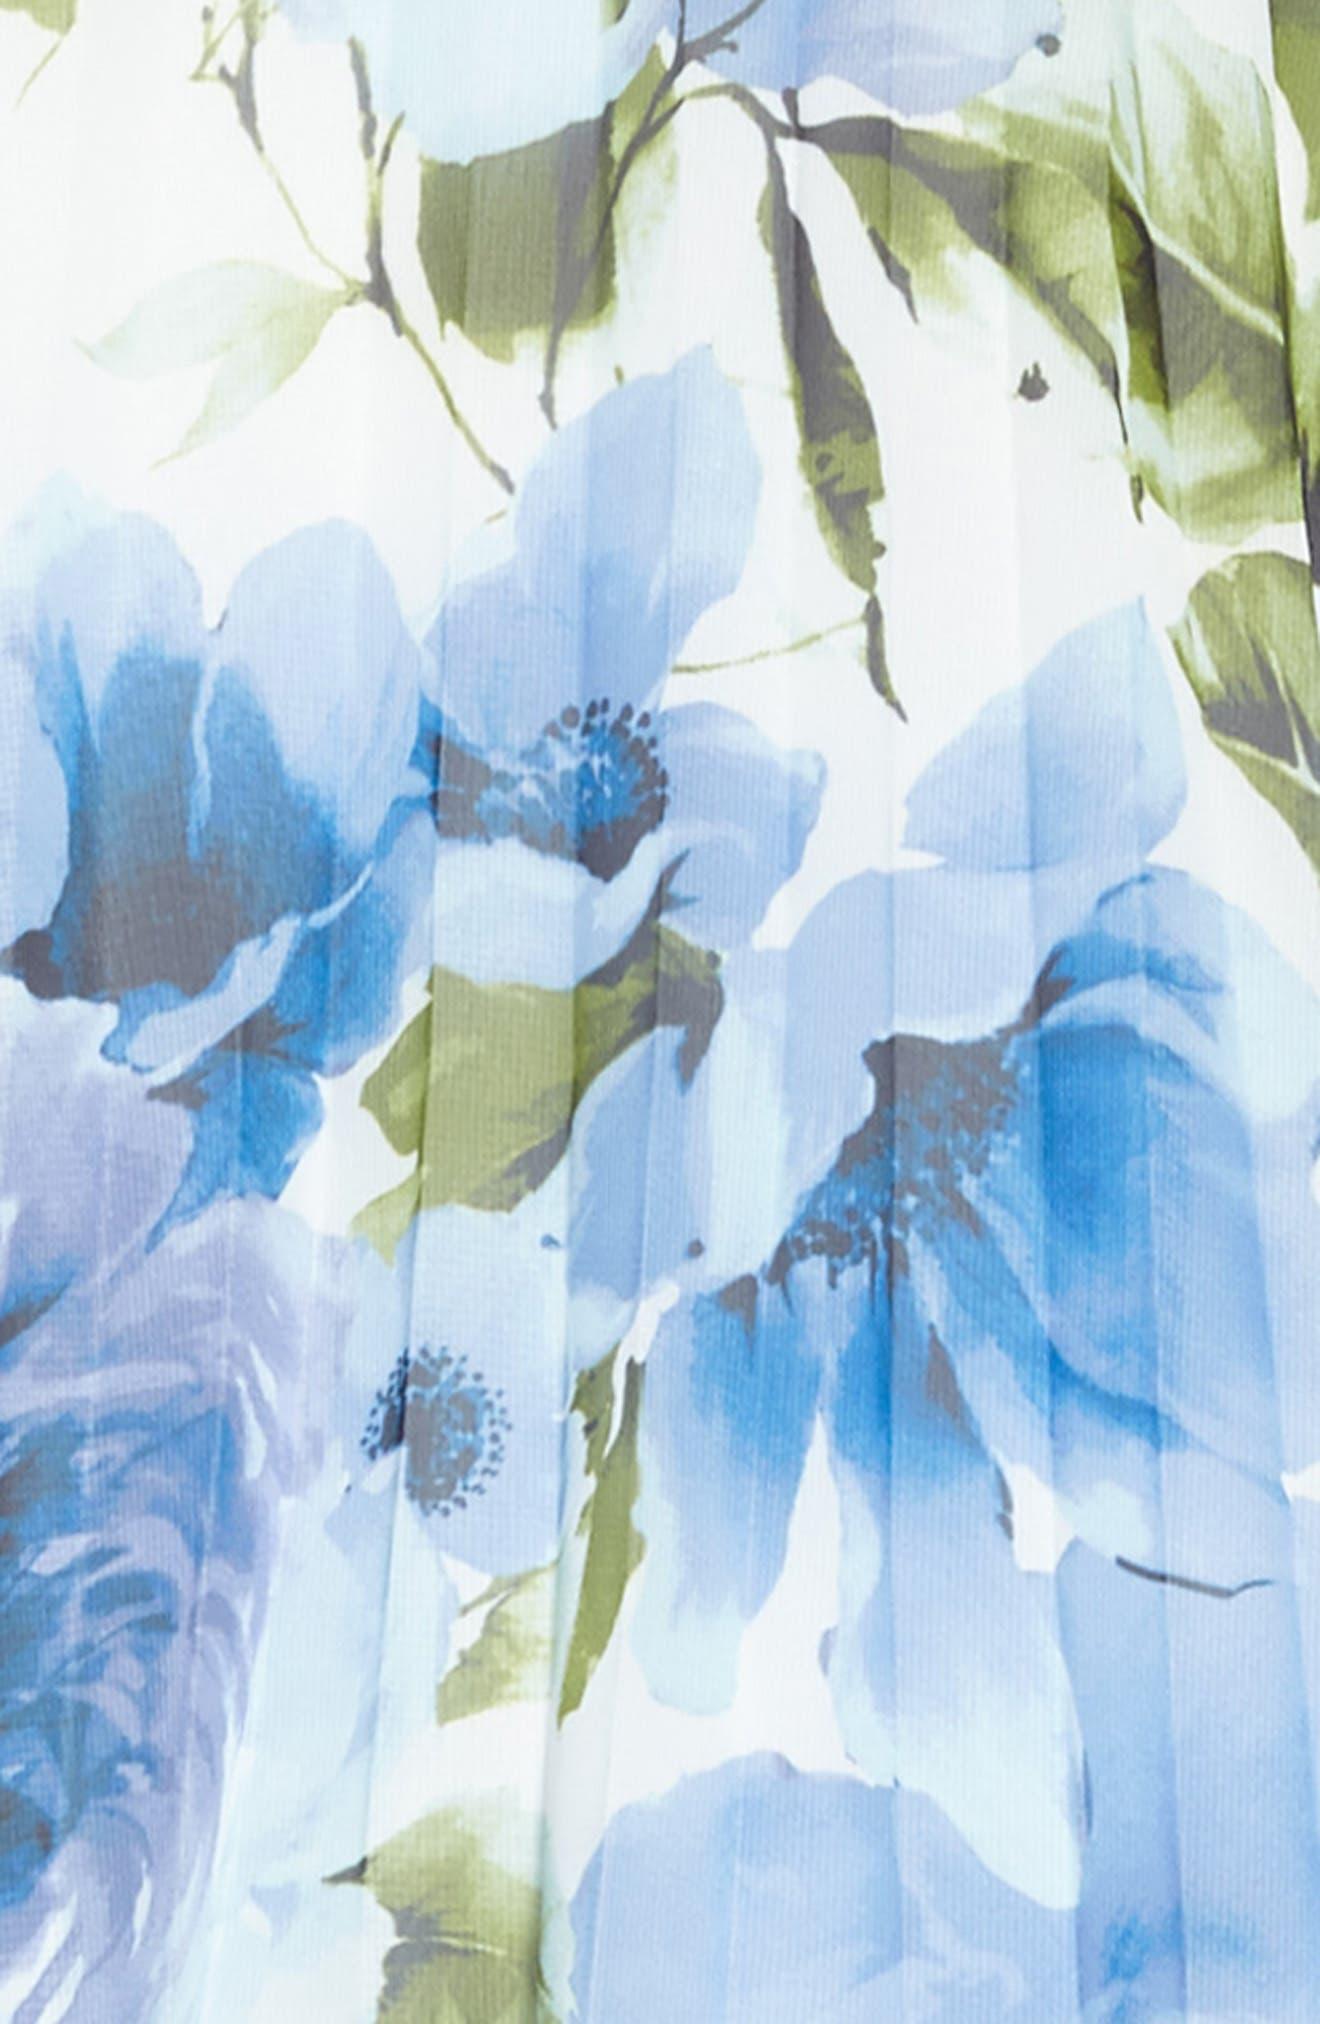 Crystal Pleat Floral Dress,                             Alternate thumbnail 3, color,                             Blue